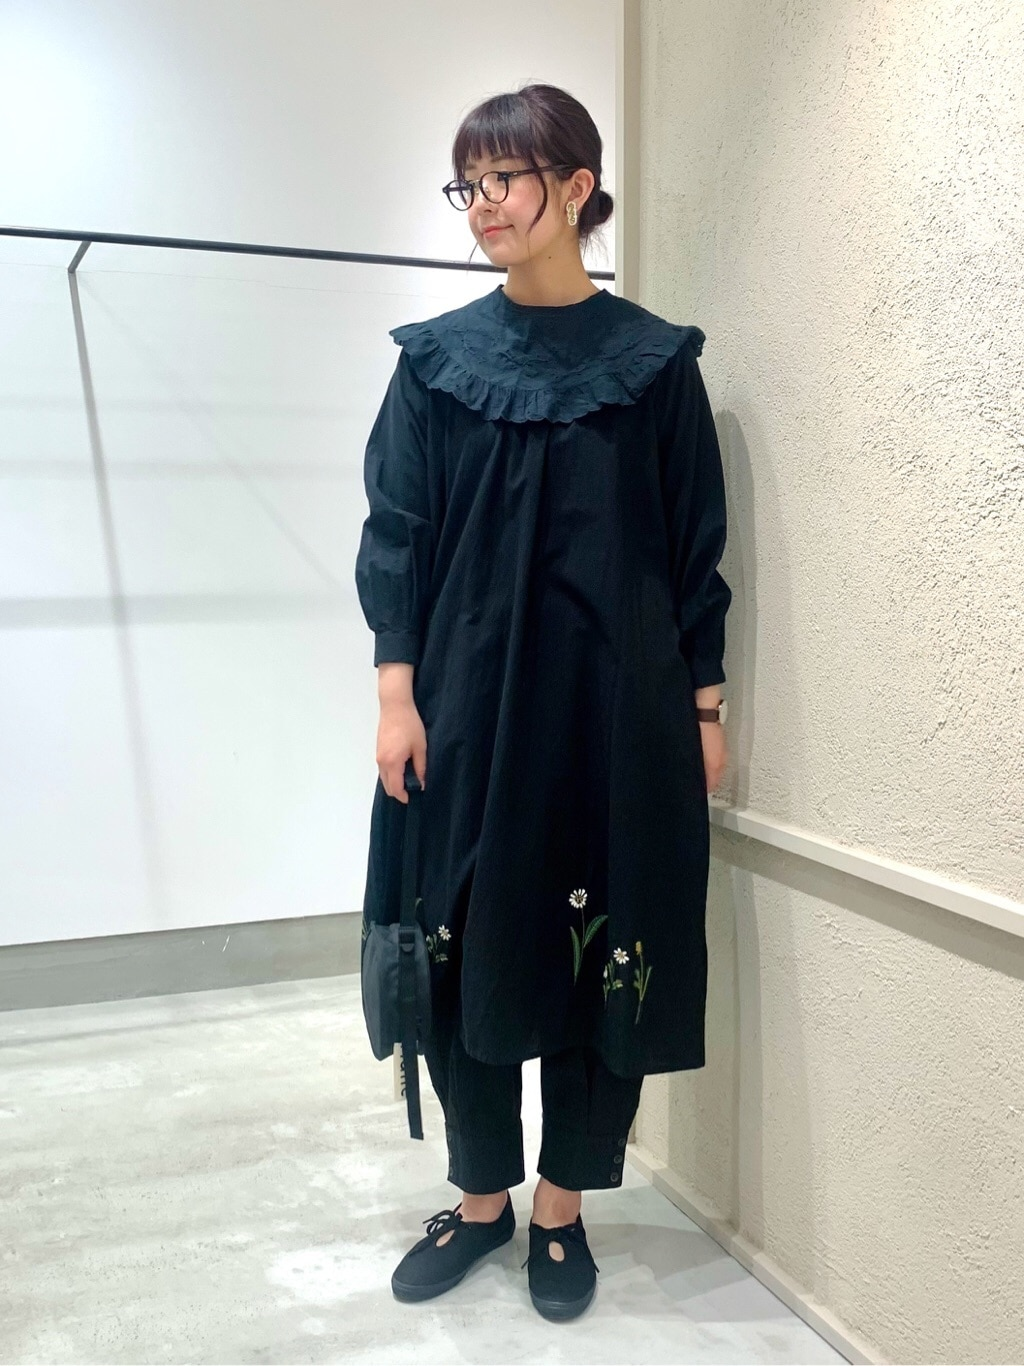 chambre de charme 横浜ジョイナス 身長:162cm 2021.02.11